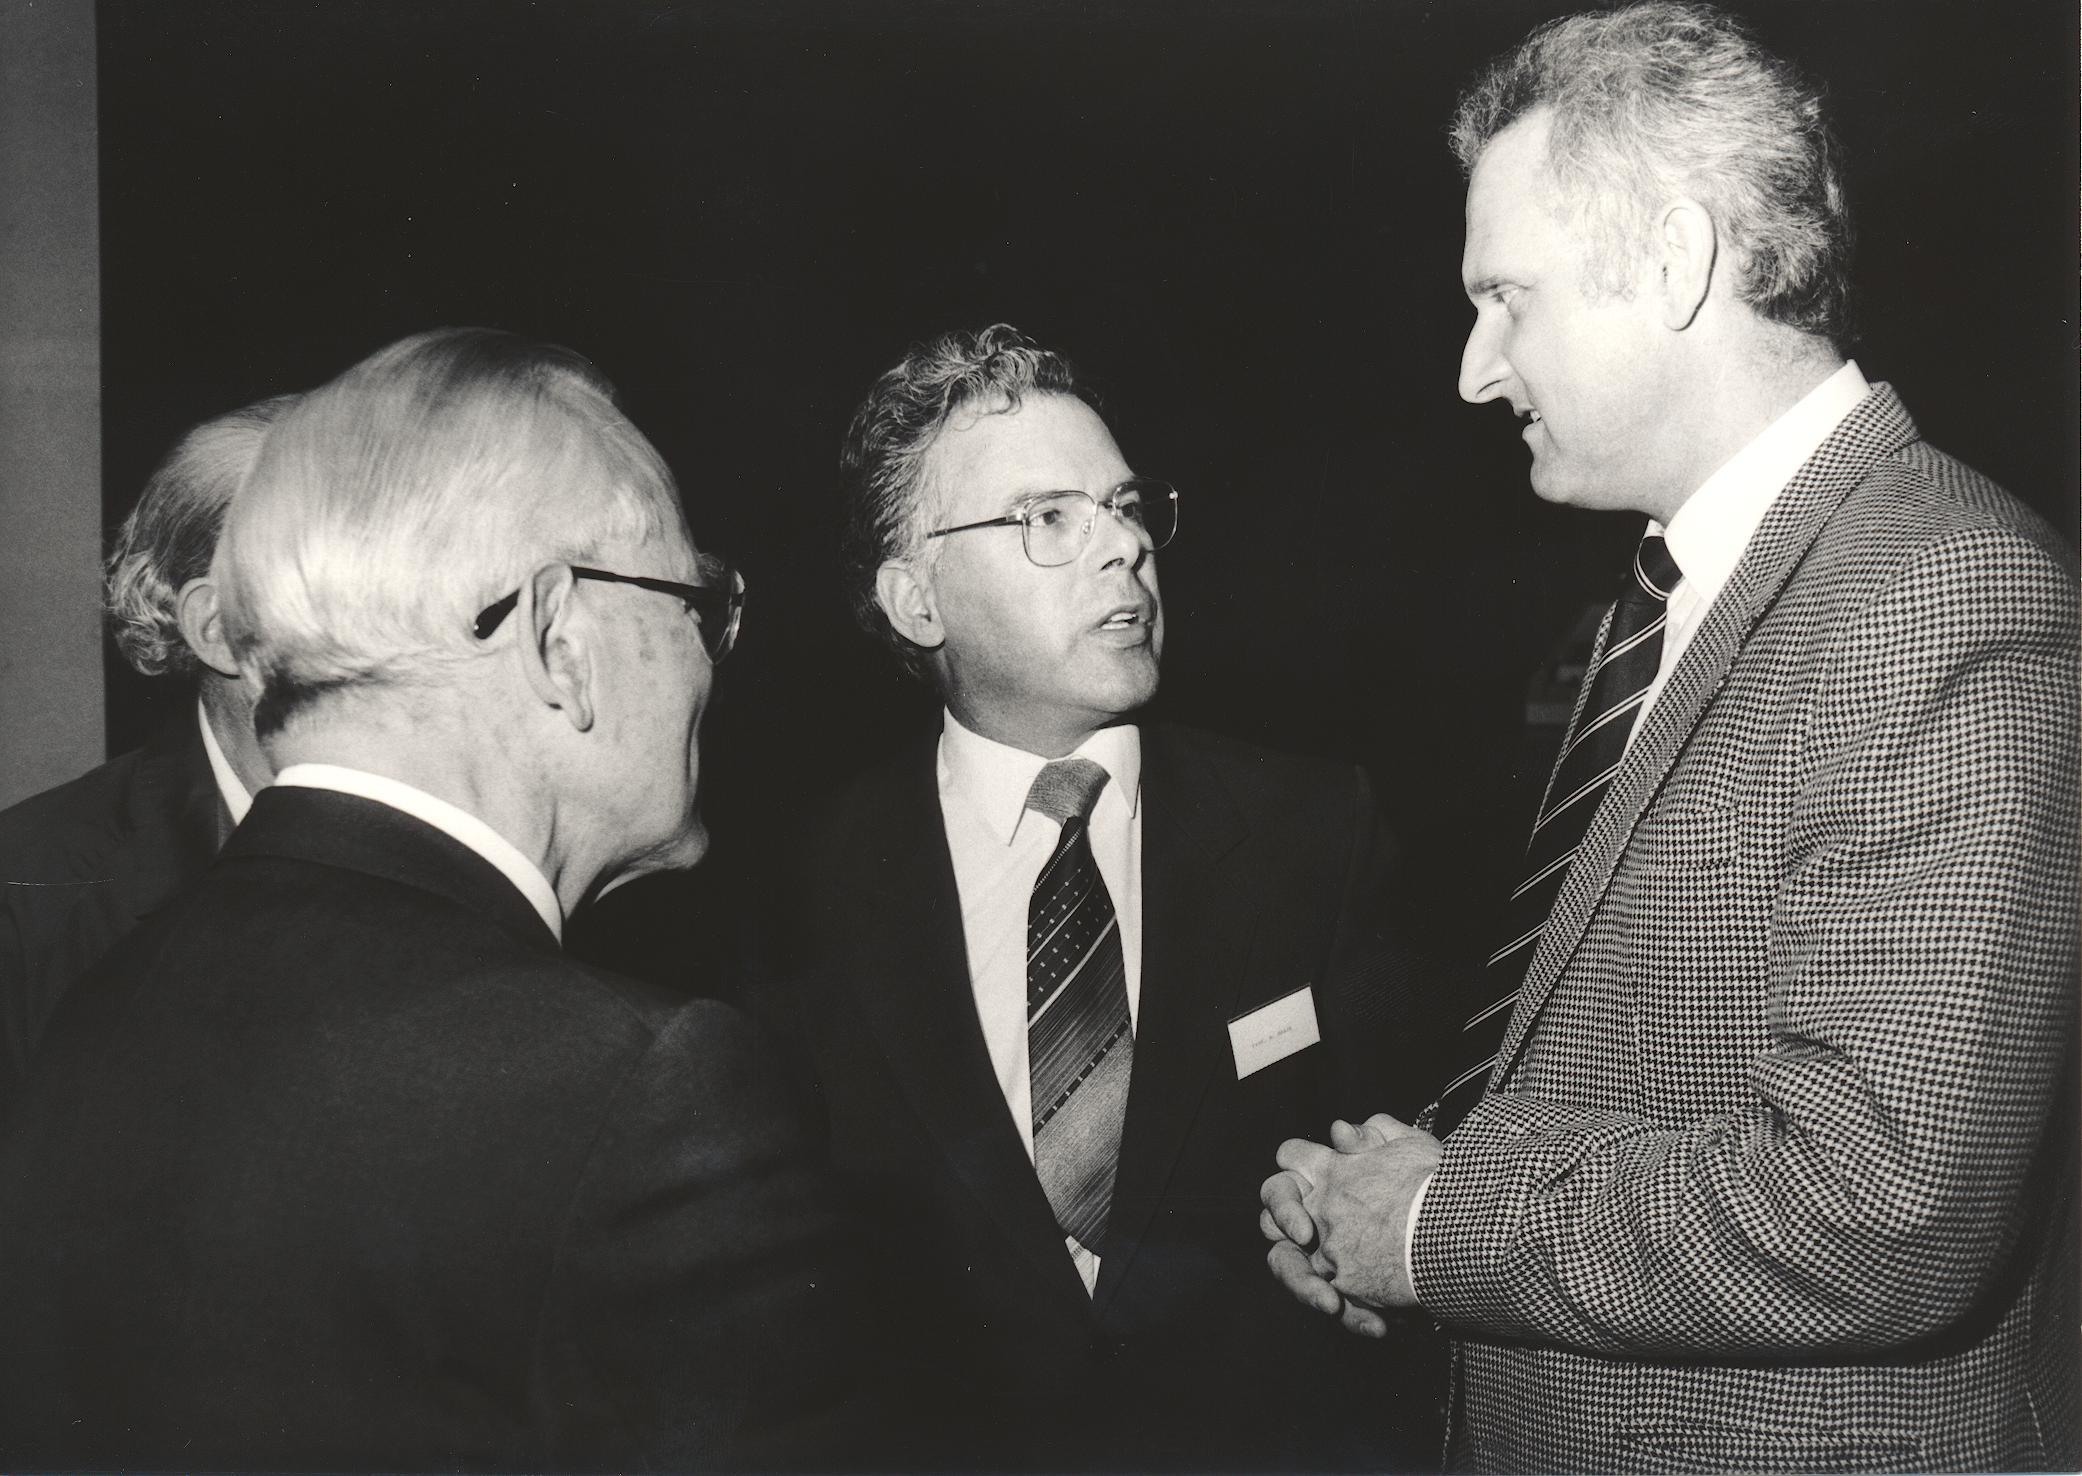 XI. Imago Mundi-Kongress 1987, Innsbruck, von links Prof. Dr. Rudolf Gross, Prof. Andreas Resch, Prof. Dr. Raimund Margreiter